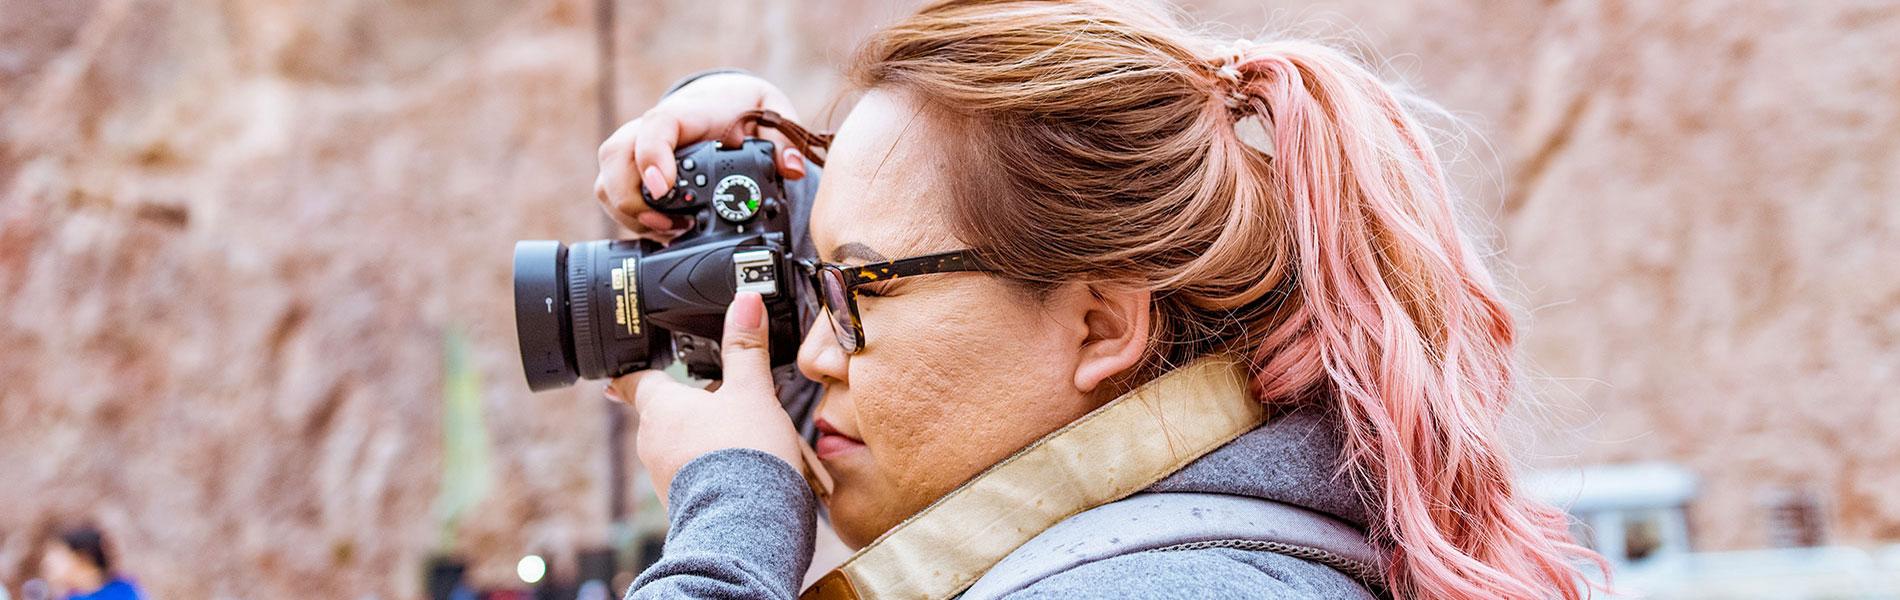 Woman aiming a dslr camera